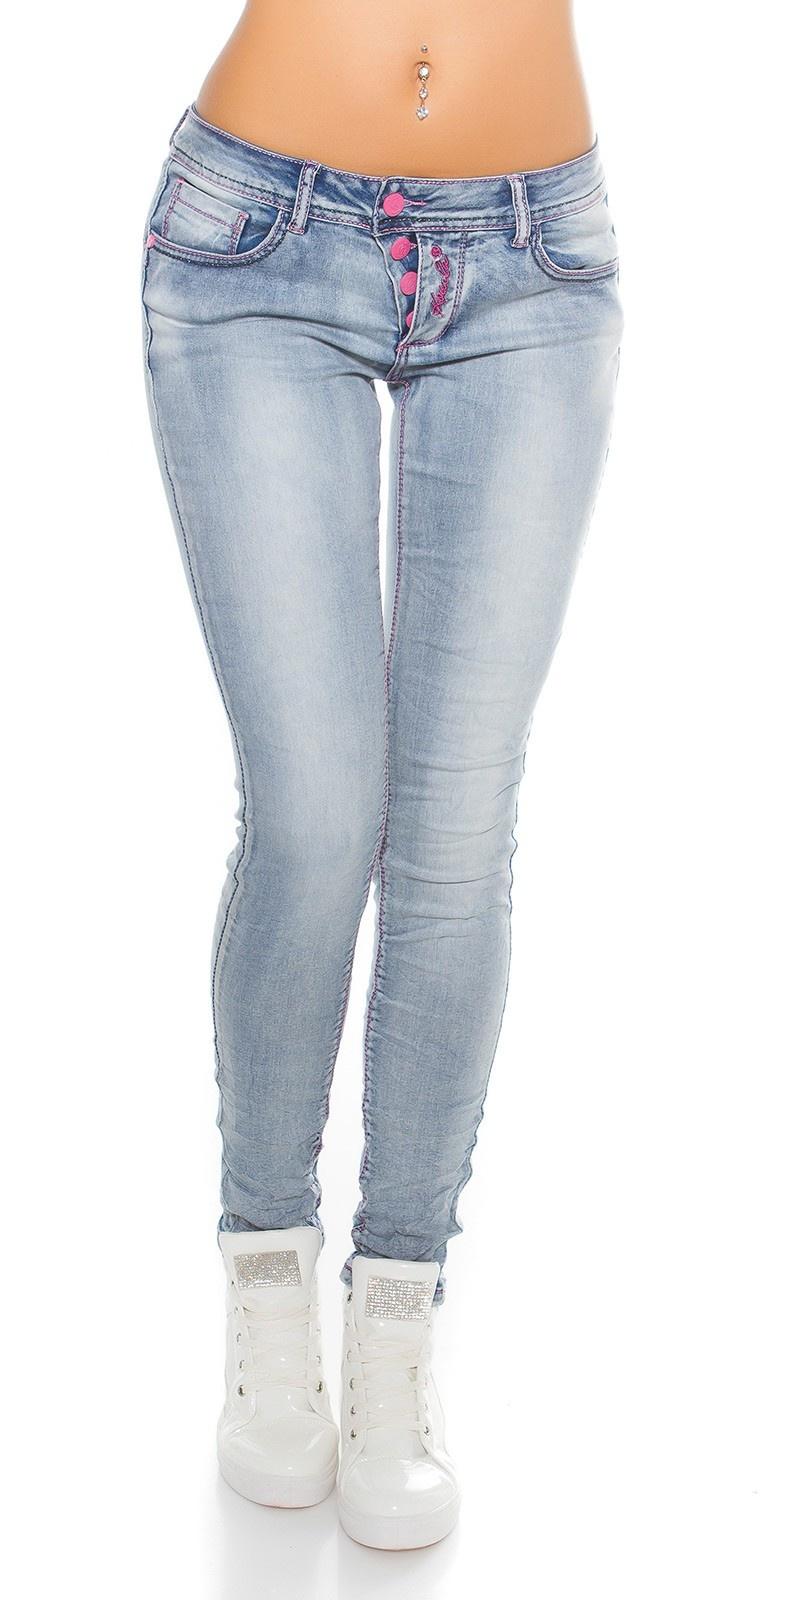 Skinny Push Up Jeans met roze knopen Blauw